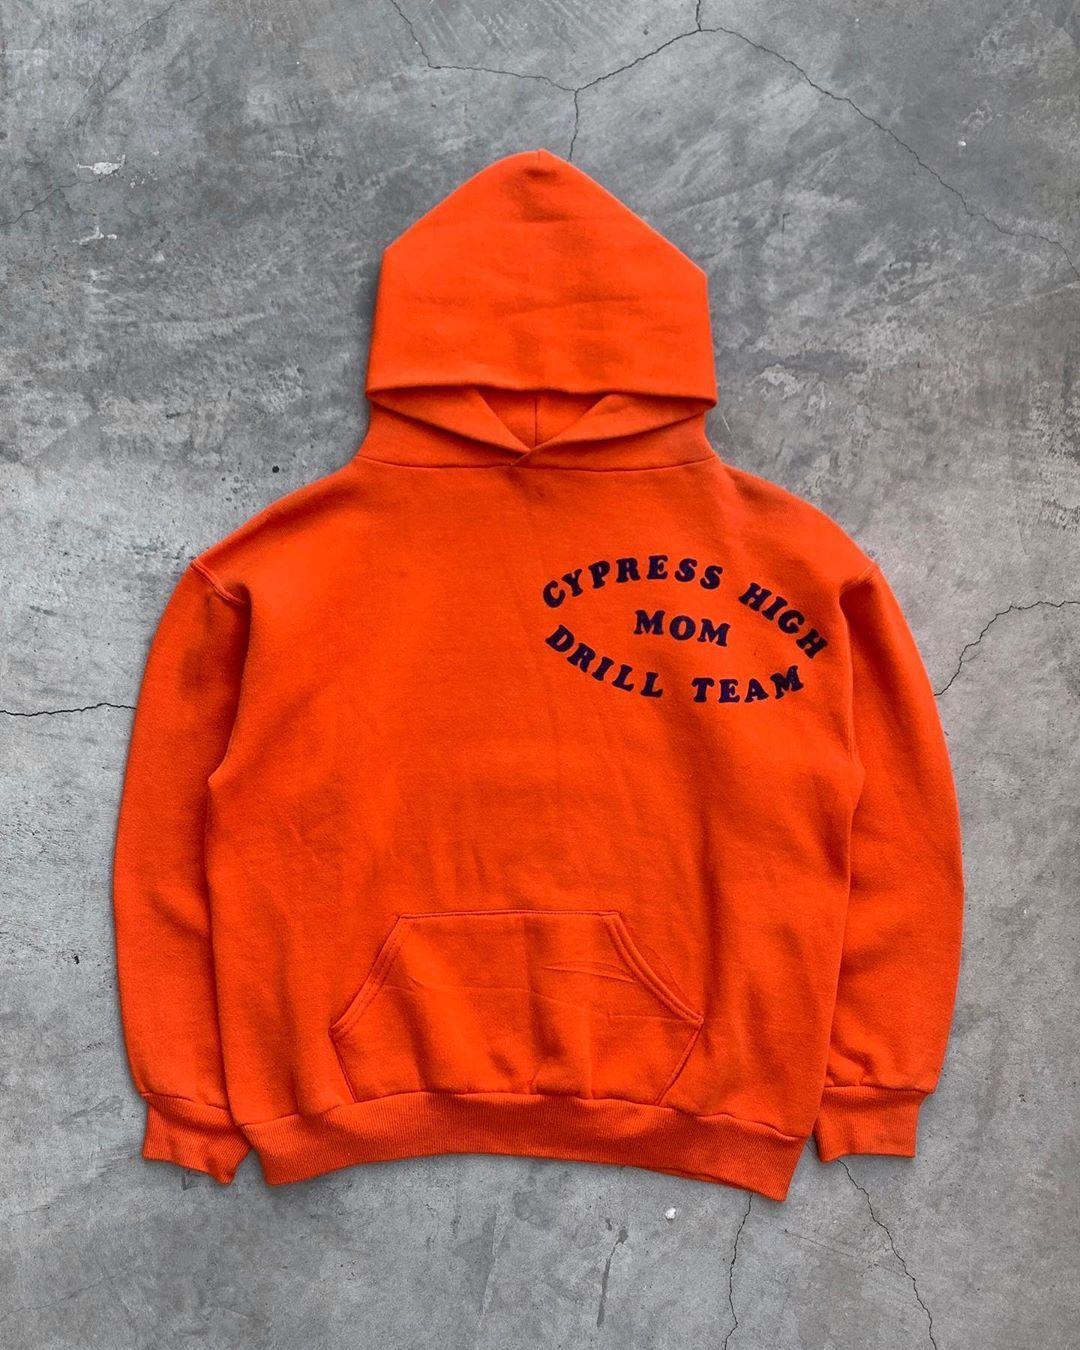 Unsound Rags On Instagram Russell Cypress High Mom Drill Team Hoodie 1990s Team Hoodies Hoodies Sweatshirts